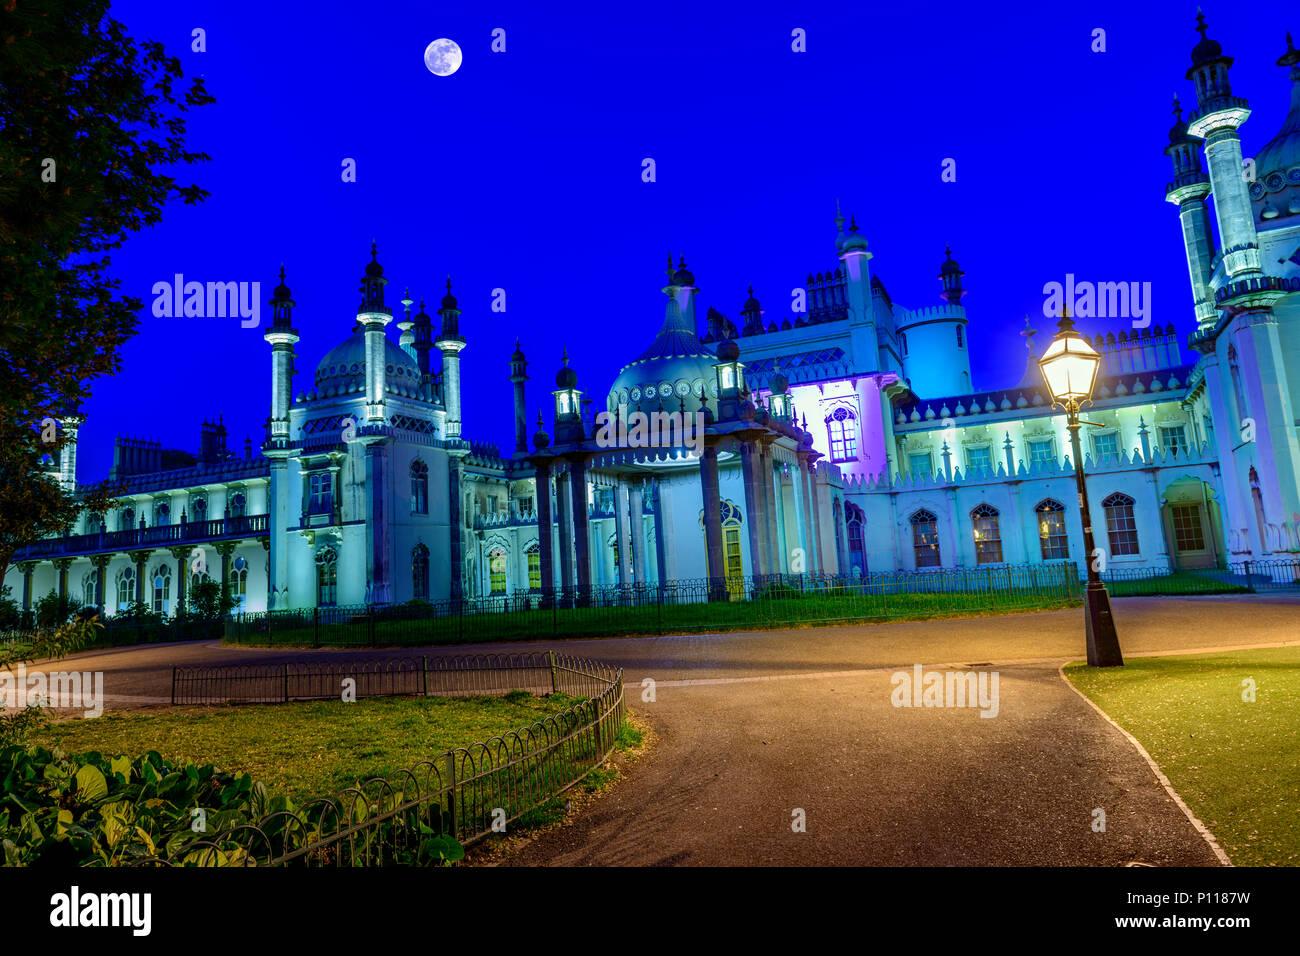 Royal pavilion Brighton at twilight. - Stock Image